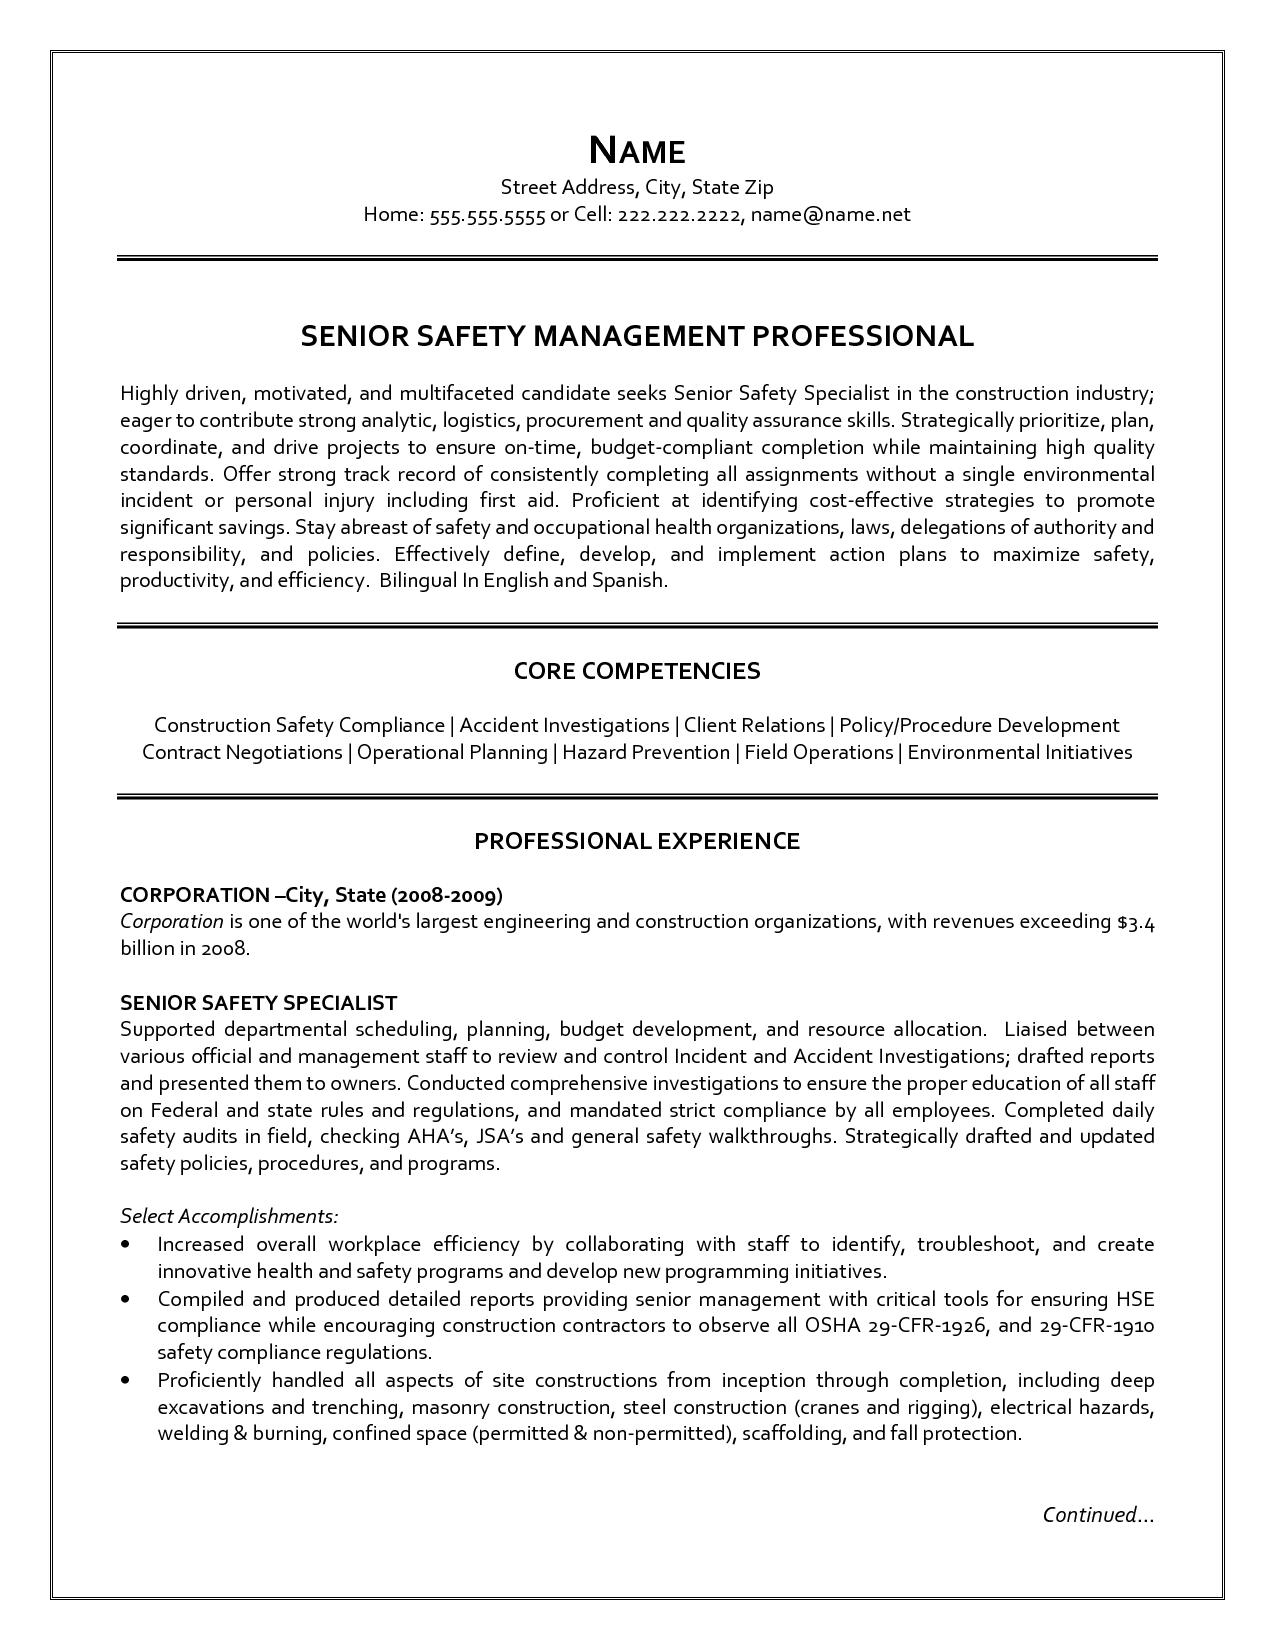 senior logistic management resume Resume of a Senior